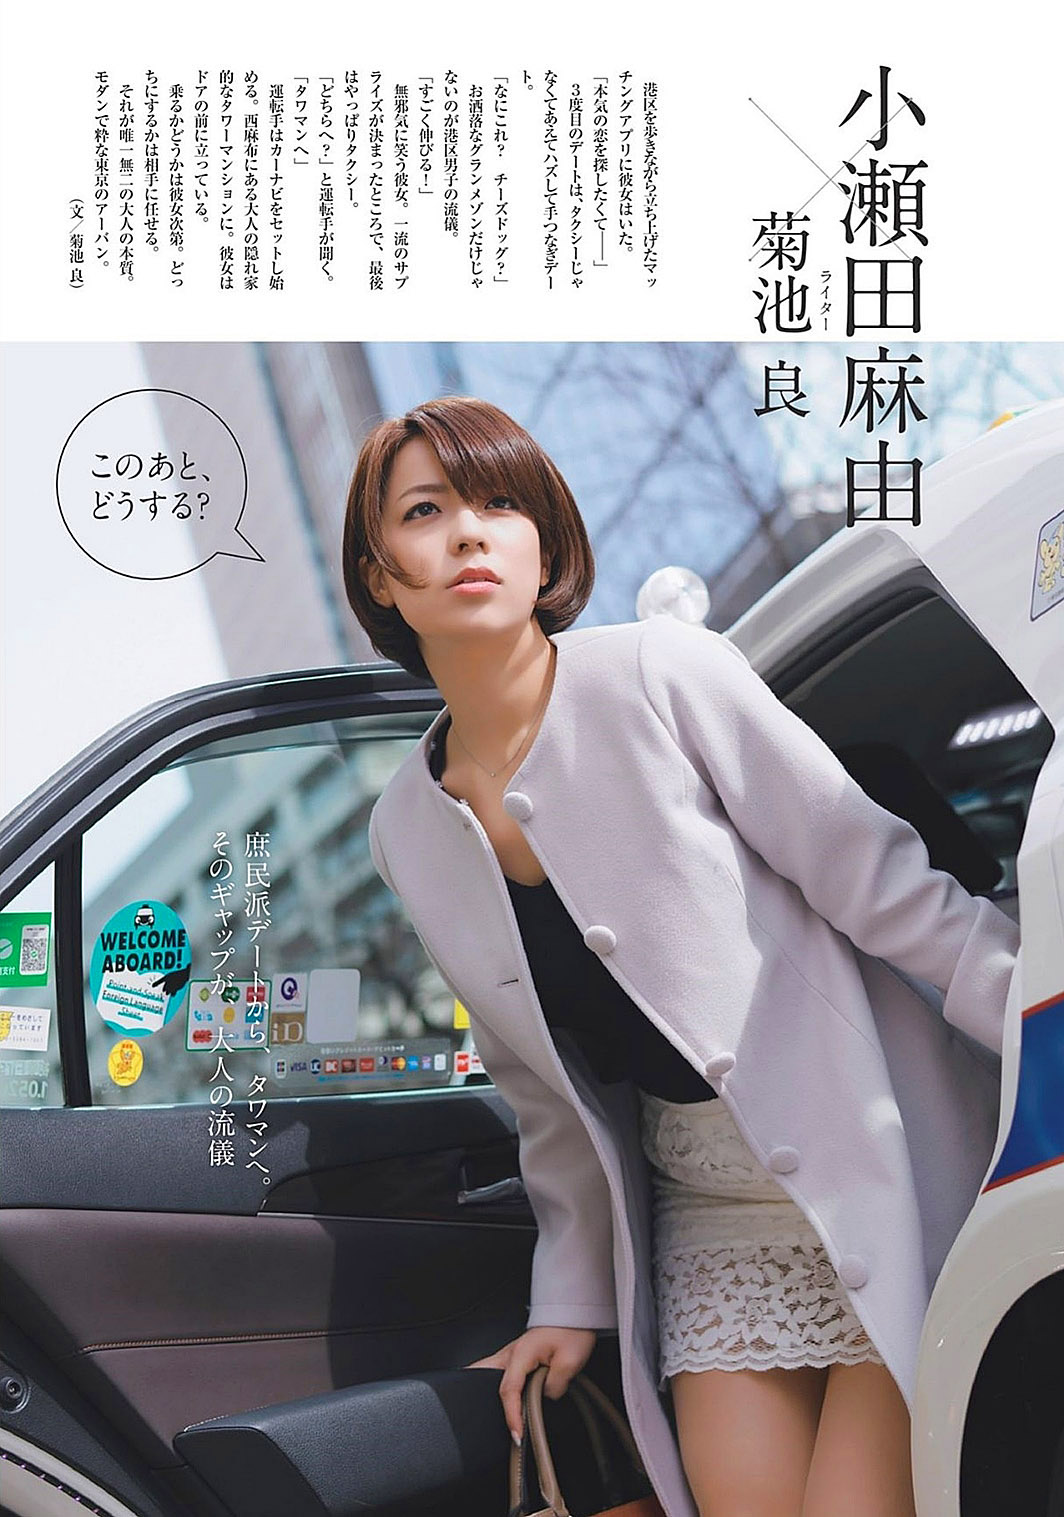 Mayu Koseta Girls 3 2019 01.jpg